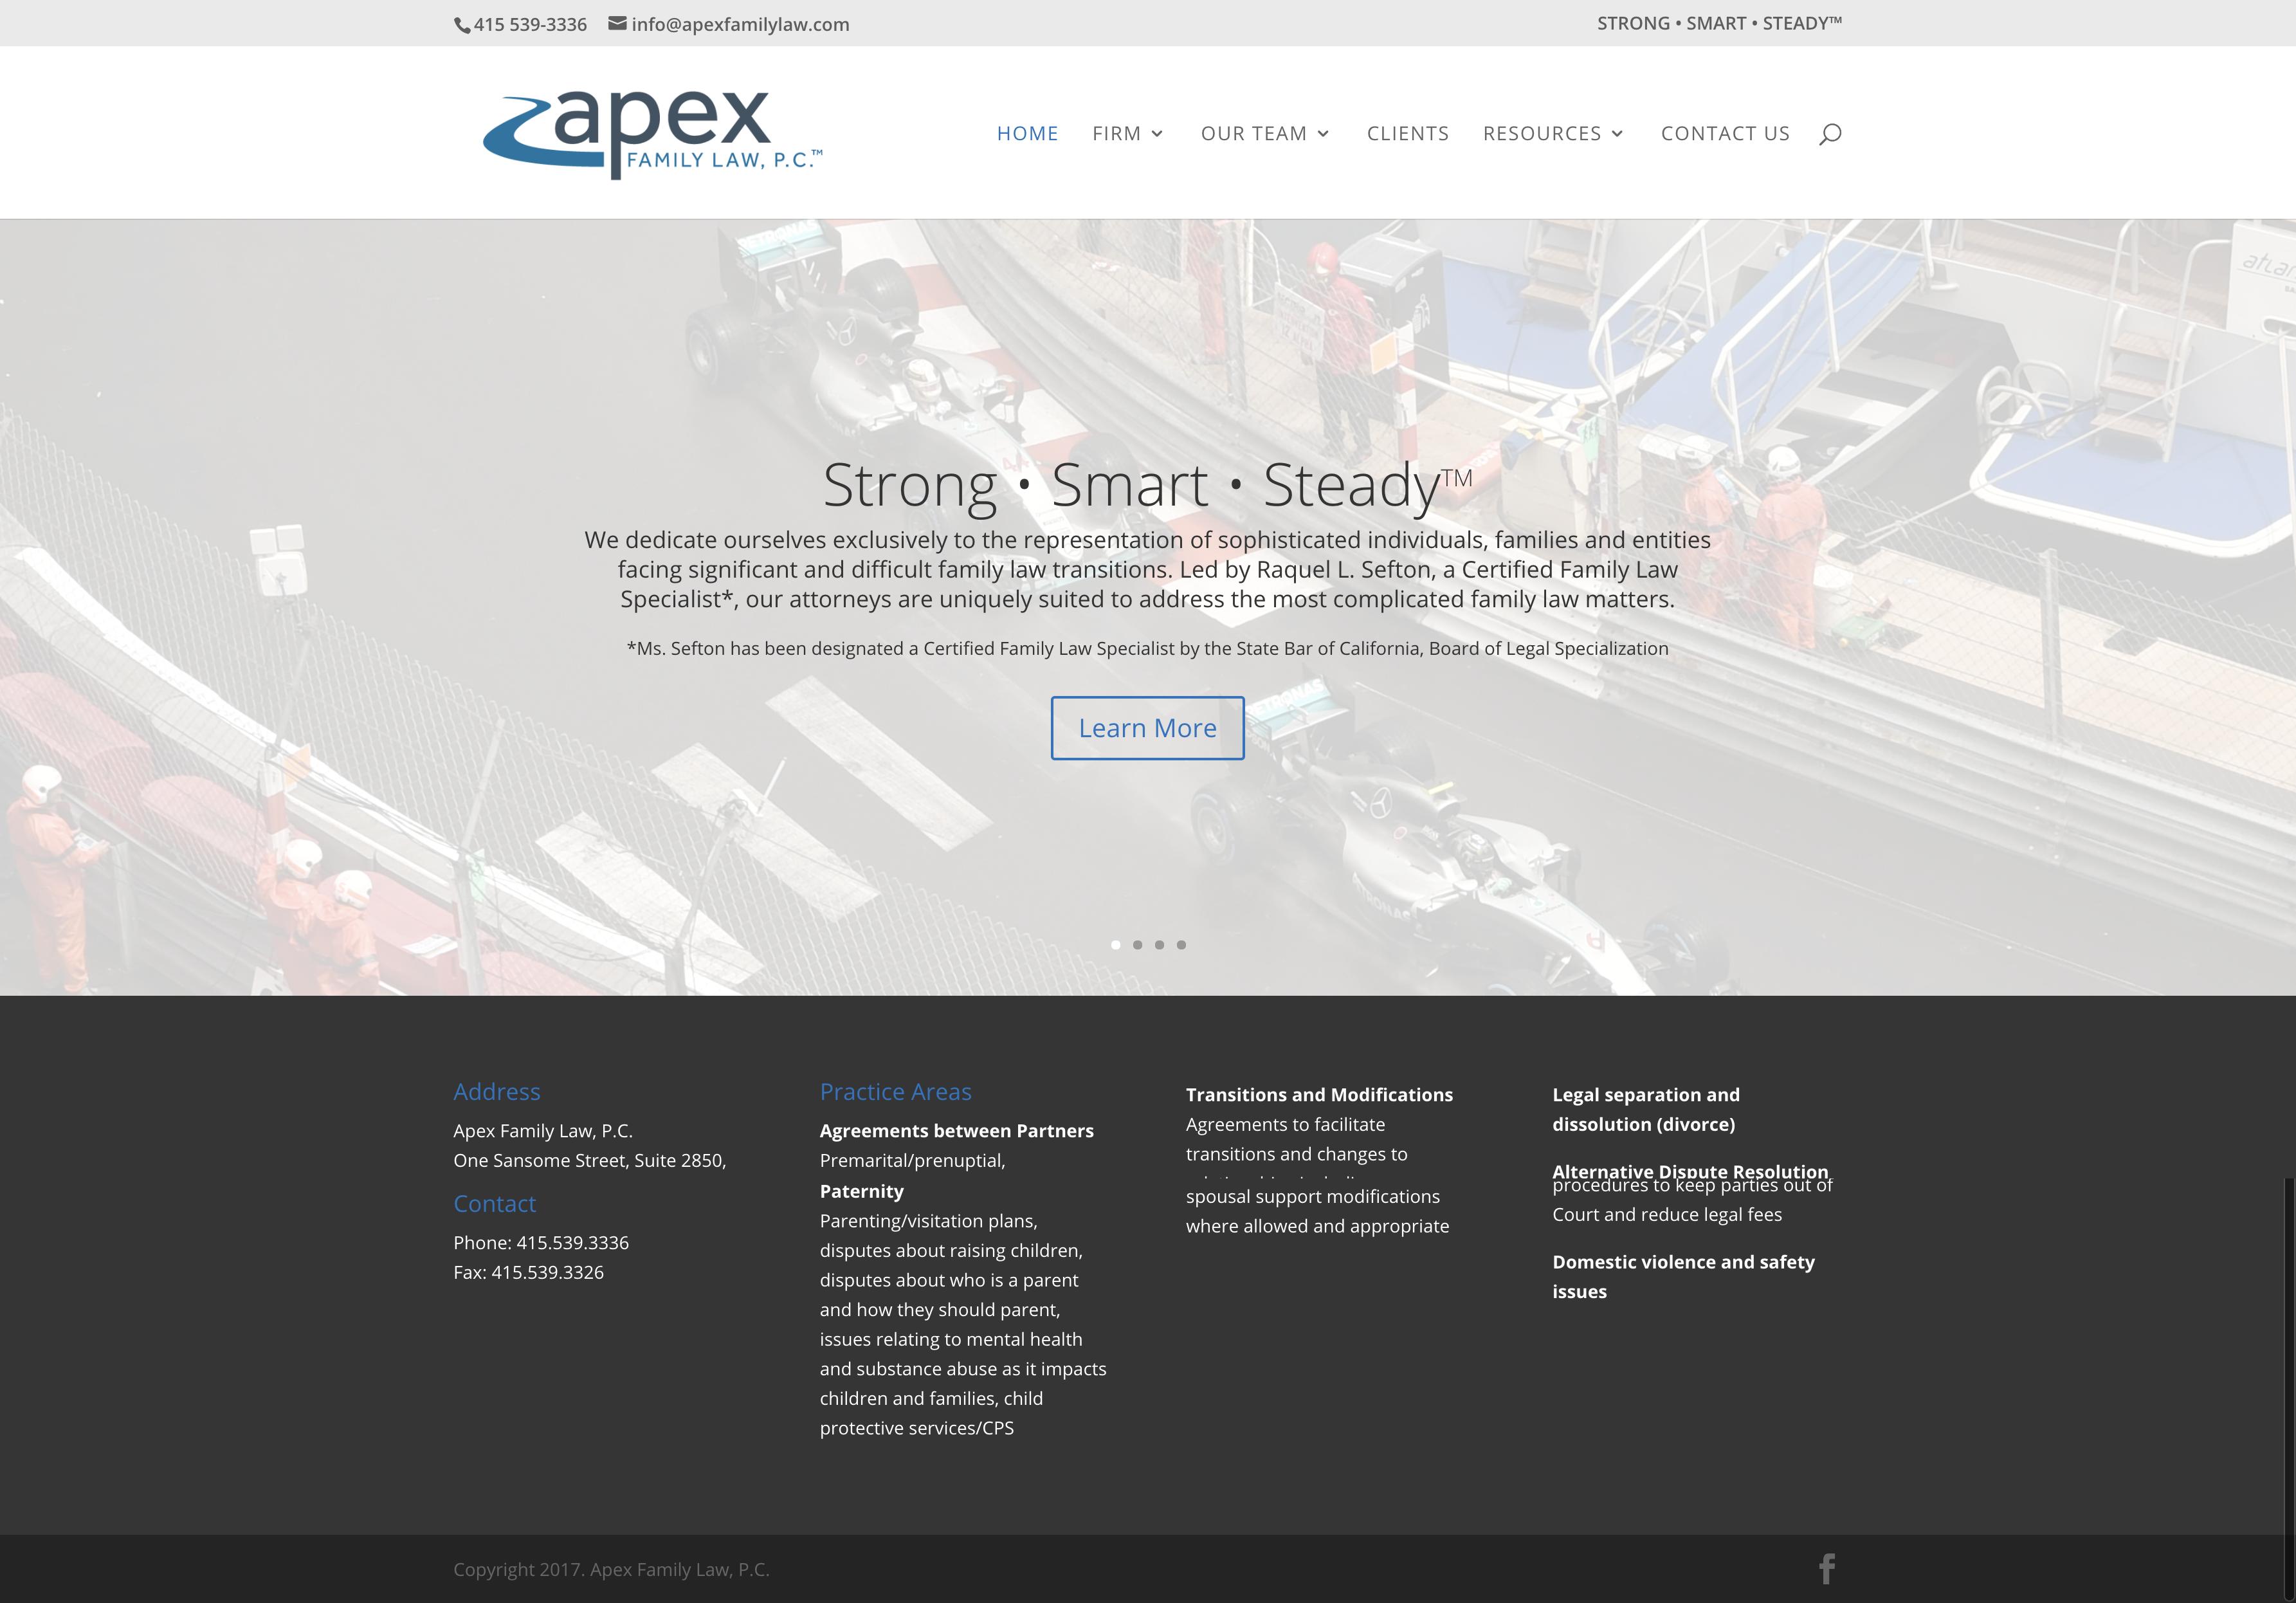 Website Design and Production | Varga Design and Marketing